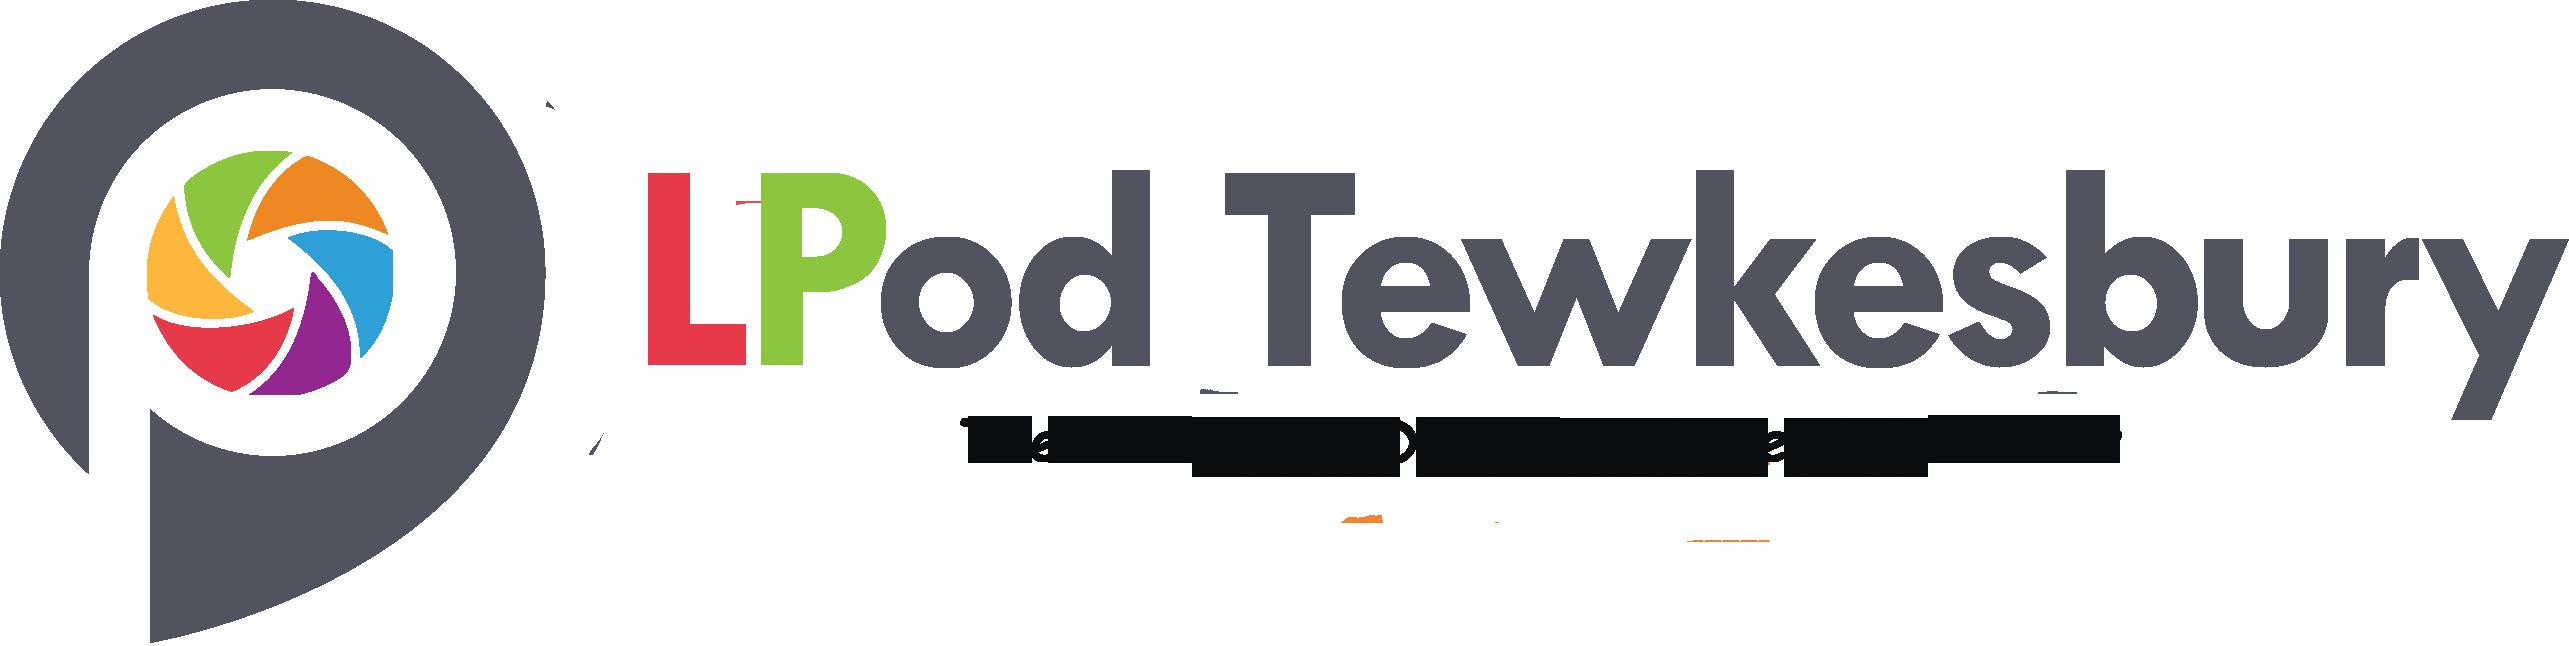 intensive driving courses tewkesbury, intensive driving lessons tewkesbury, intenzive driving school tewkesbury